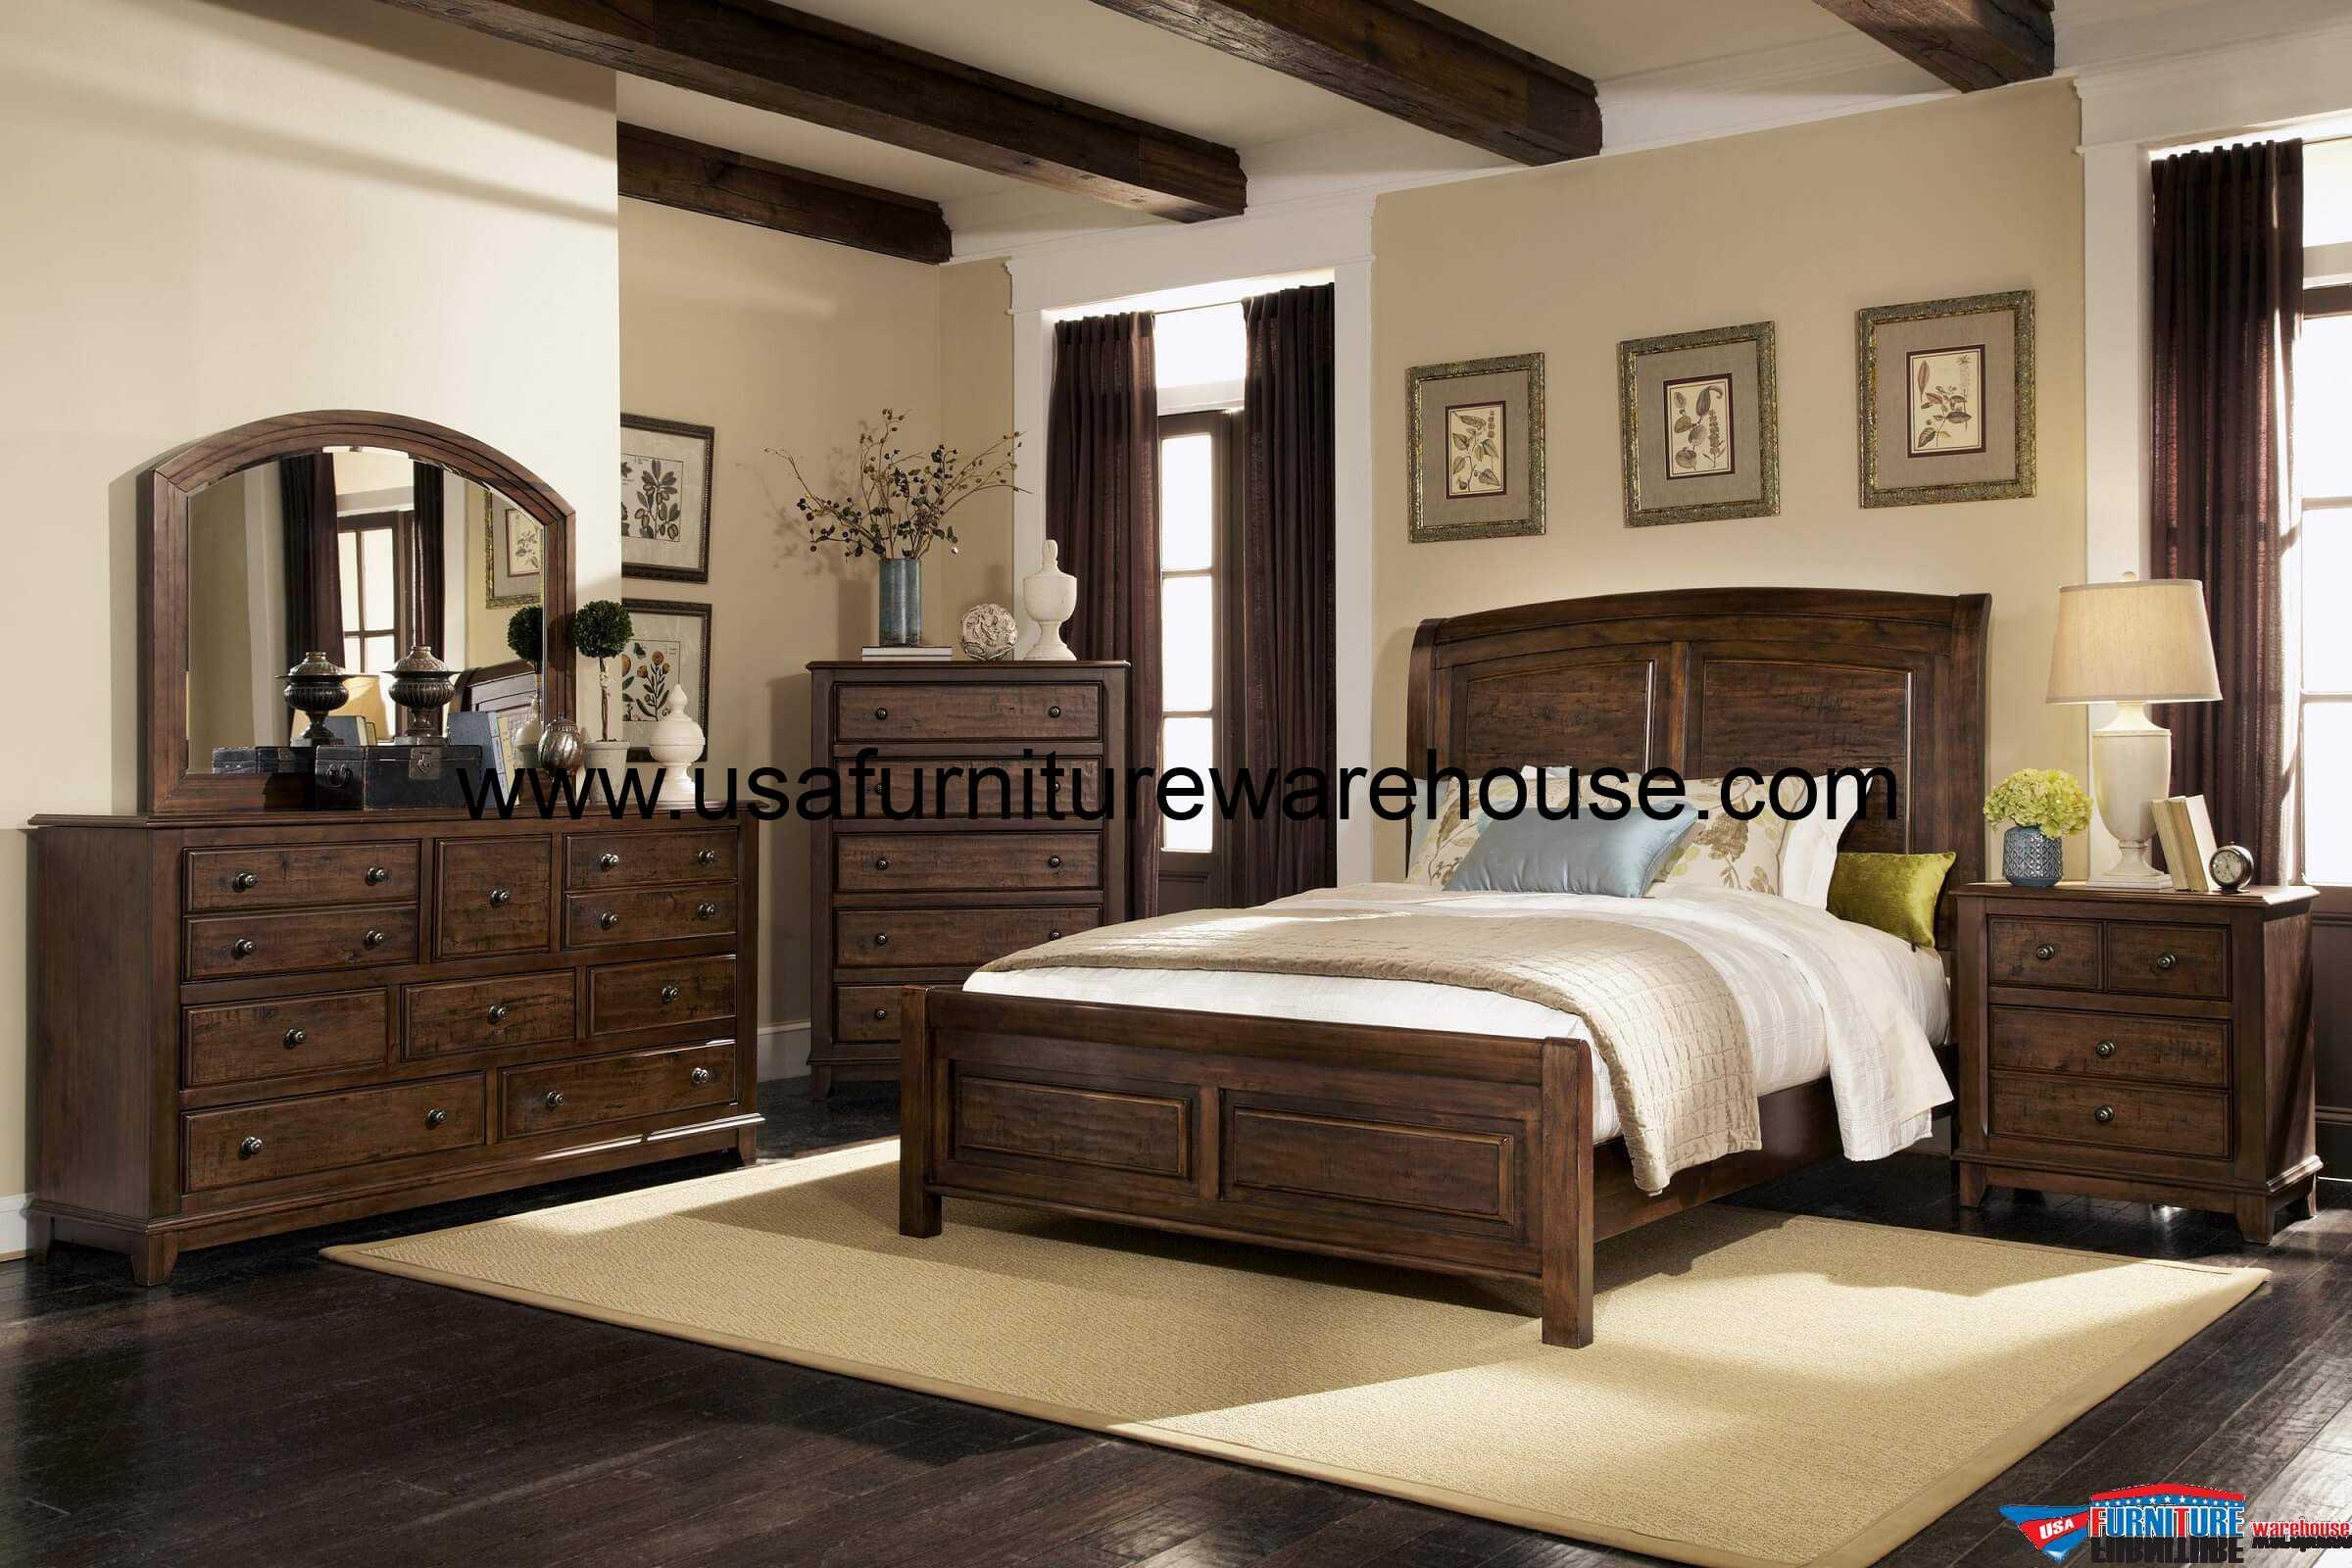 Coaster Furniture 4-Pc Laughton Panel Distress Bedroom Set